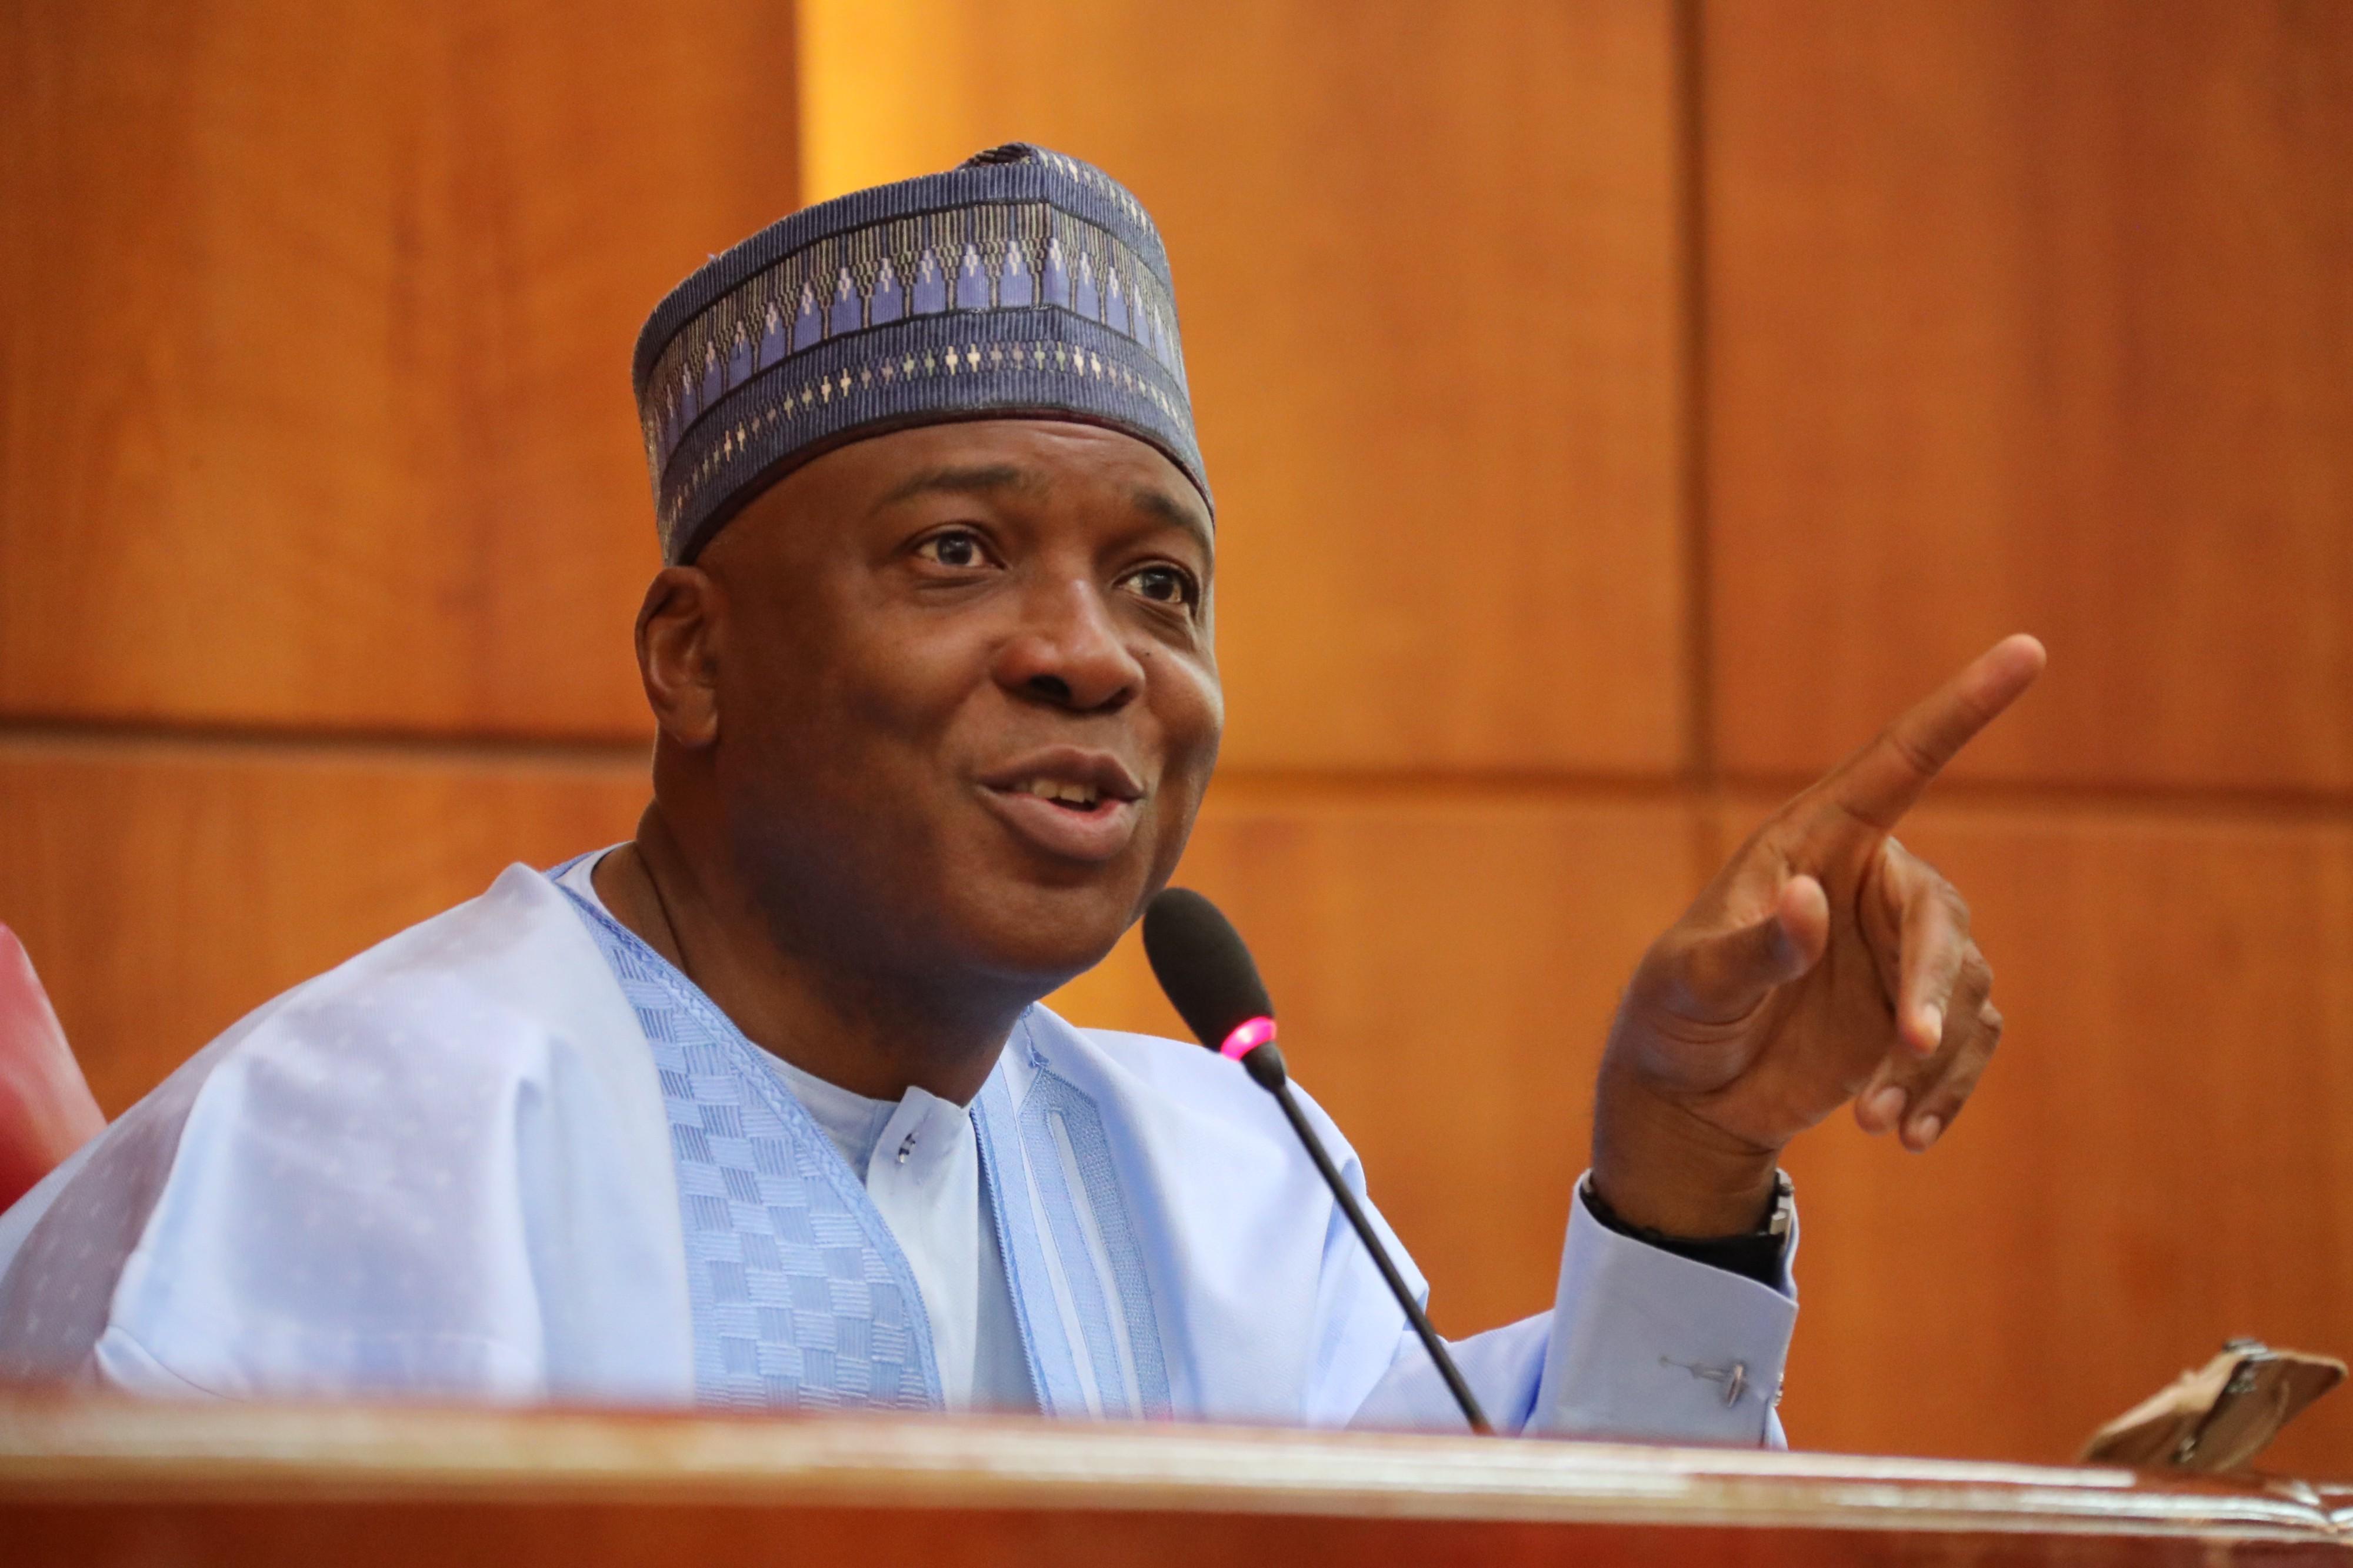 Nigeria needs new vision...current system not working, says Saraki